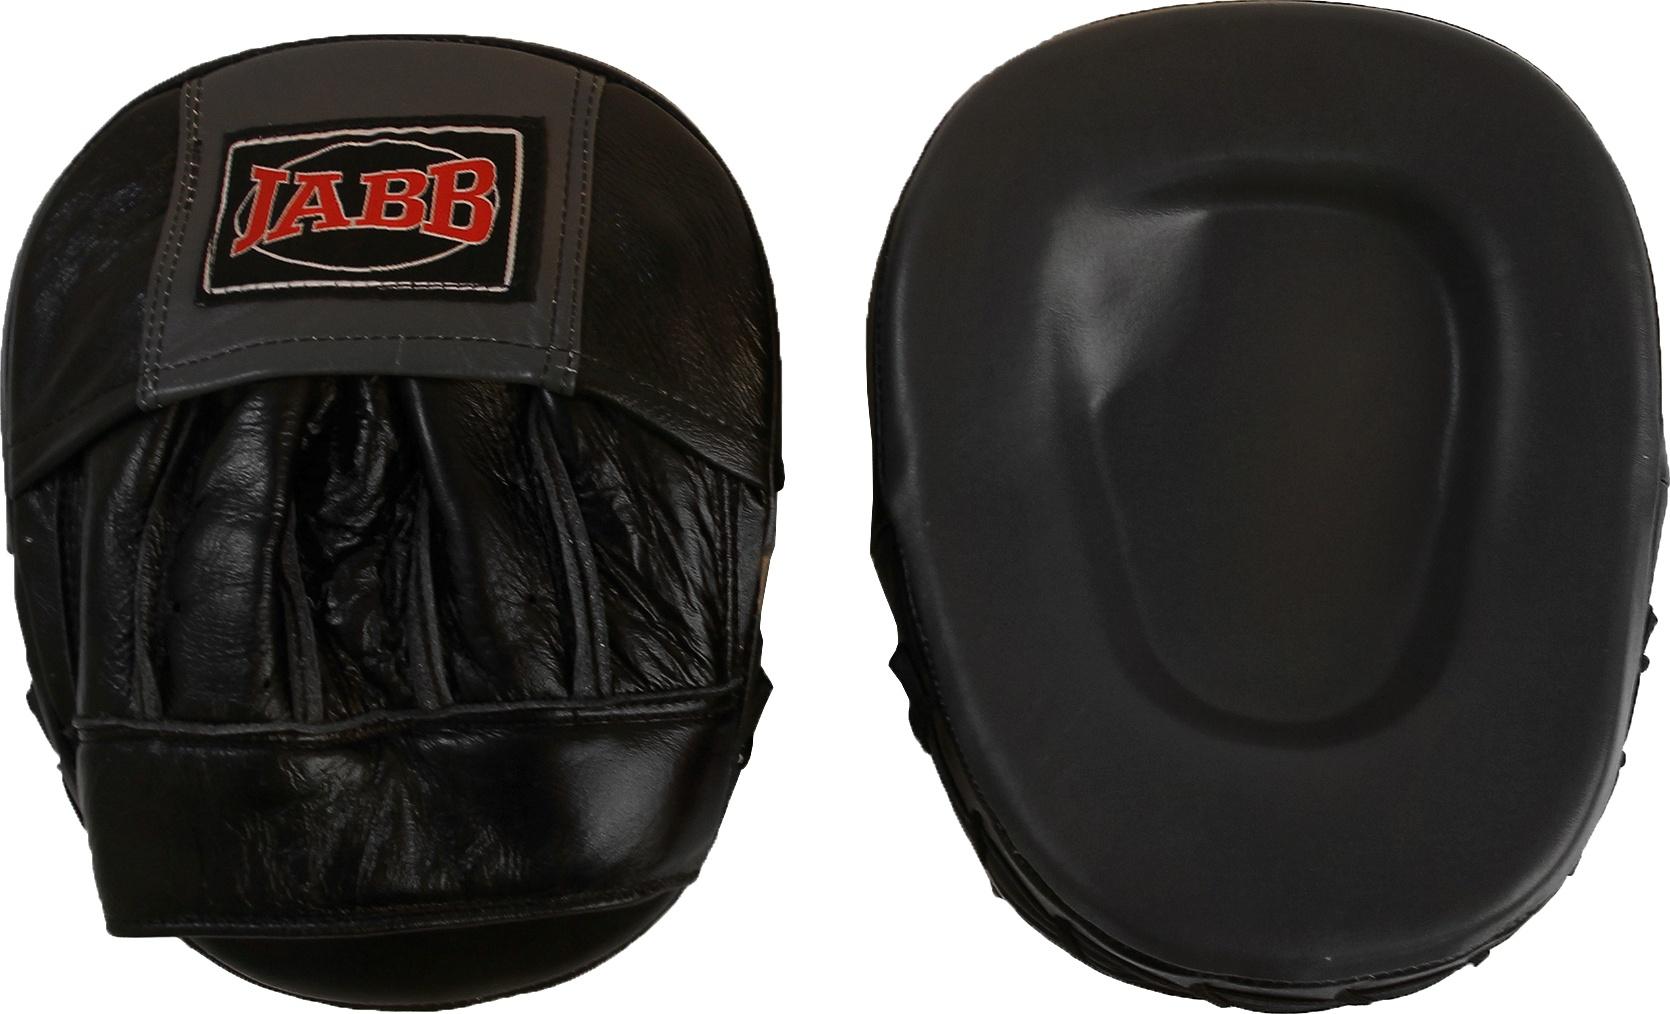 Боксерские лапы Jabb JE 5000 черные